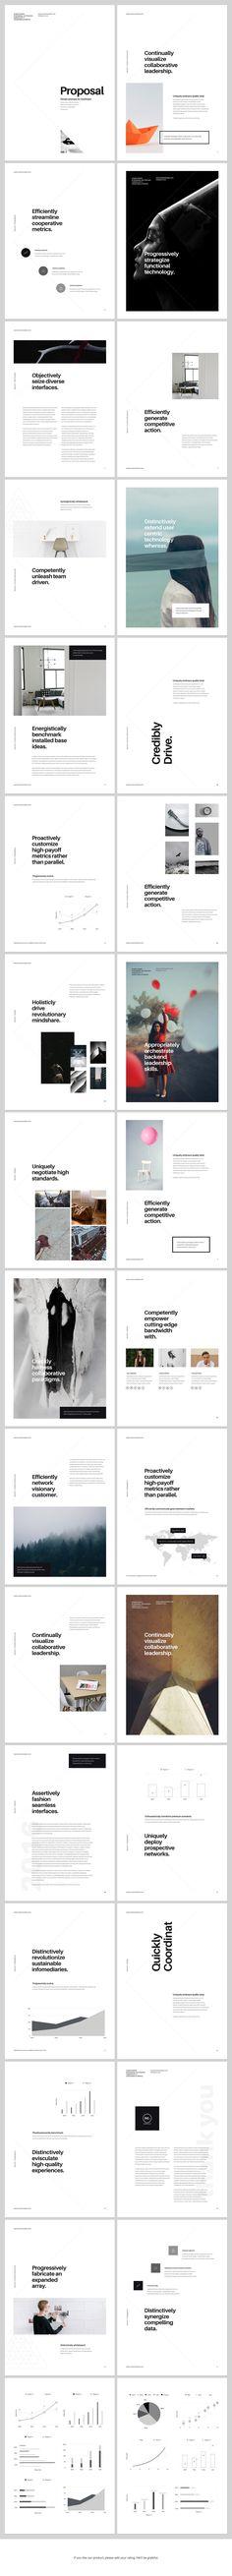 Keynote Presentation by GoaShape on Creative Market layout - photos Layout Design, Design De Configuration, Design Visual, Graphisches Design, Buch Design, Print Layout, Graphic Design Layouts, Contents Page Design, Flyer Design